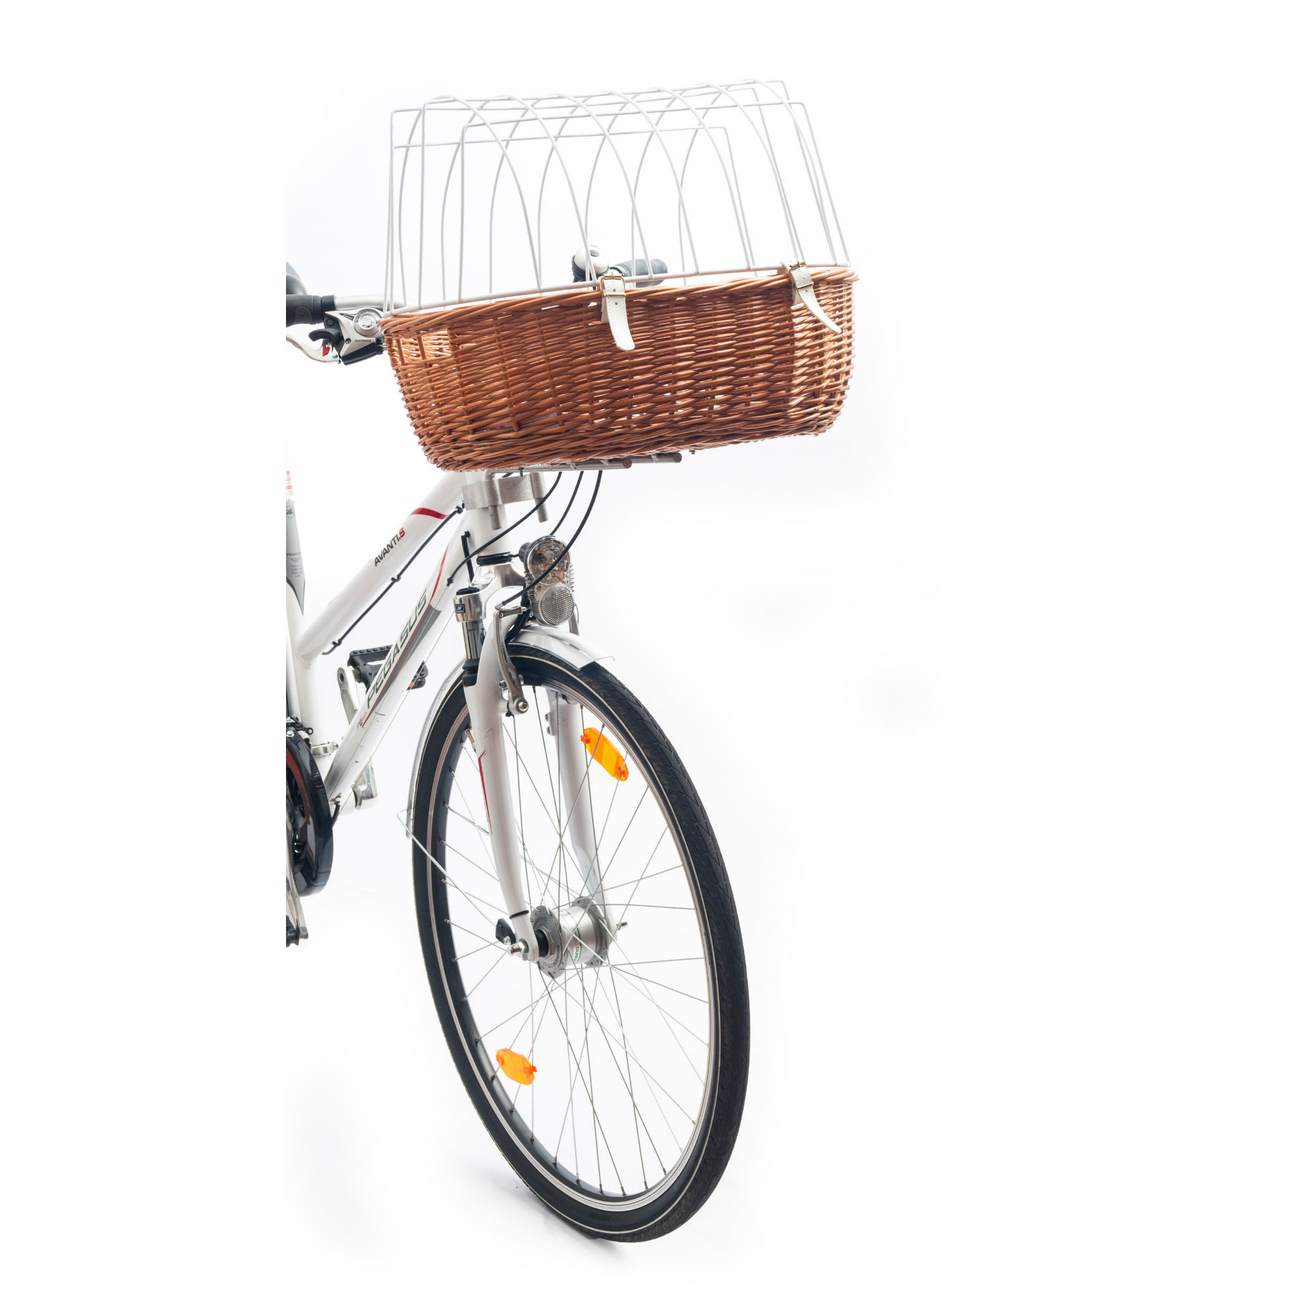 Aumüller E-Bike Hunde Fahrradkorb Standard vorne, Bild 4